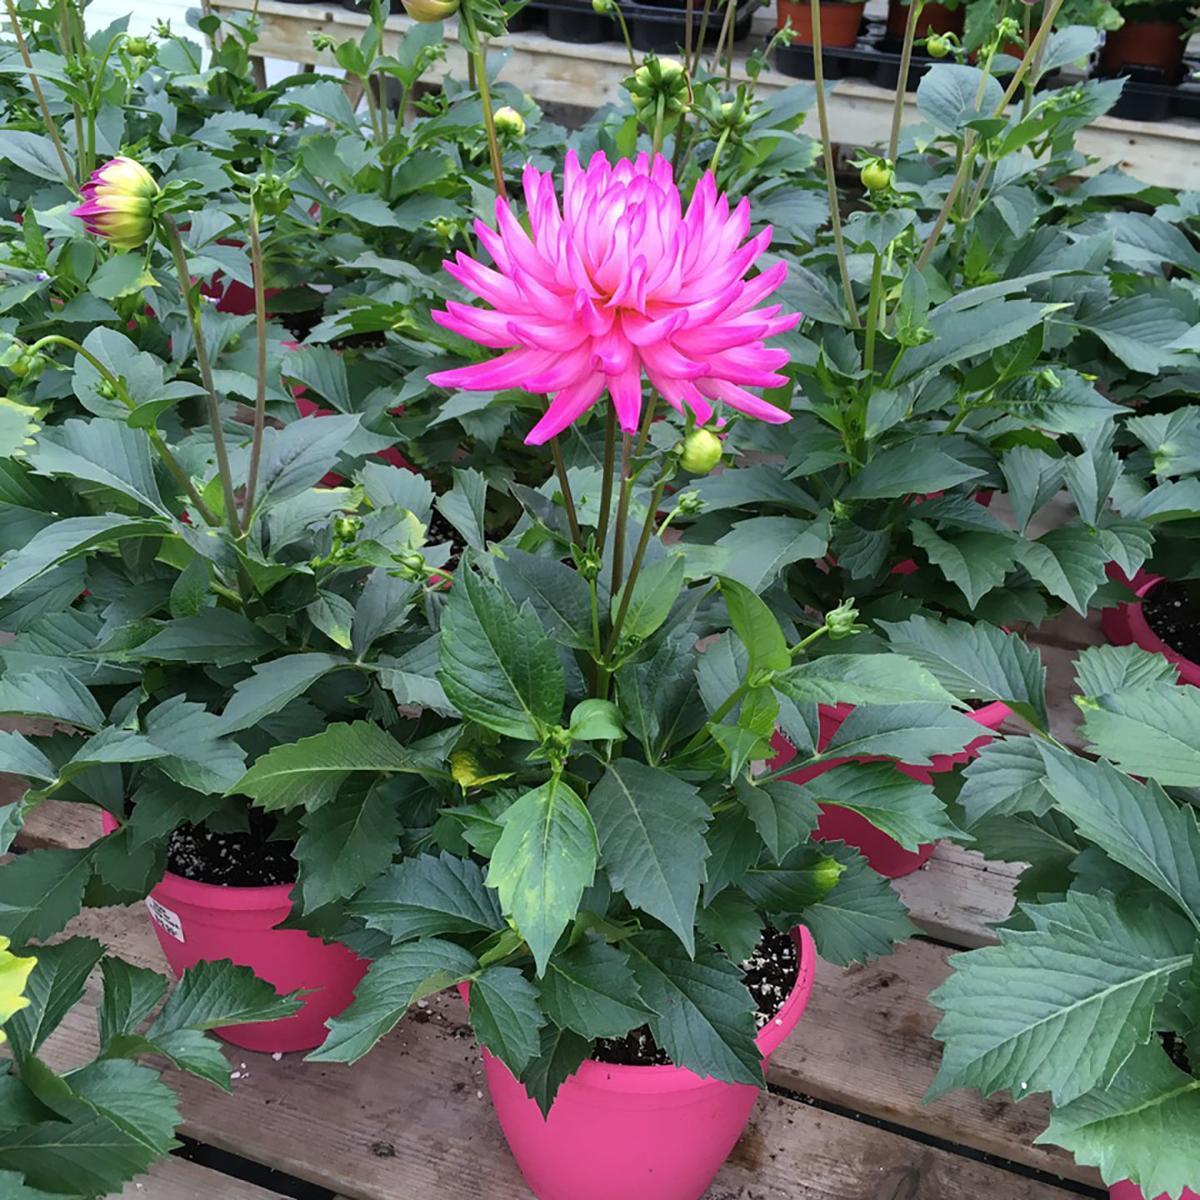 Elaine Sanders: Get a jump on the gardening season